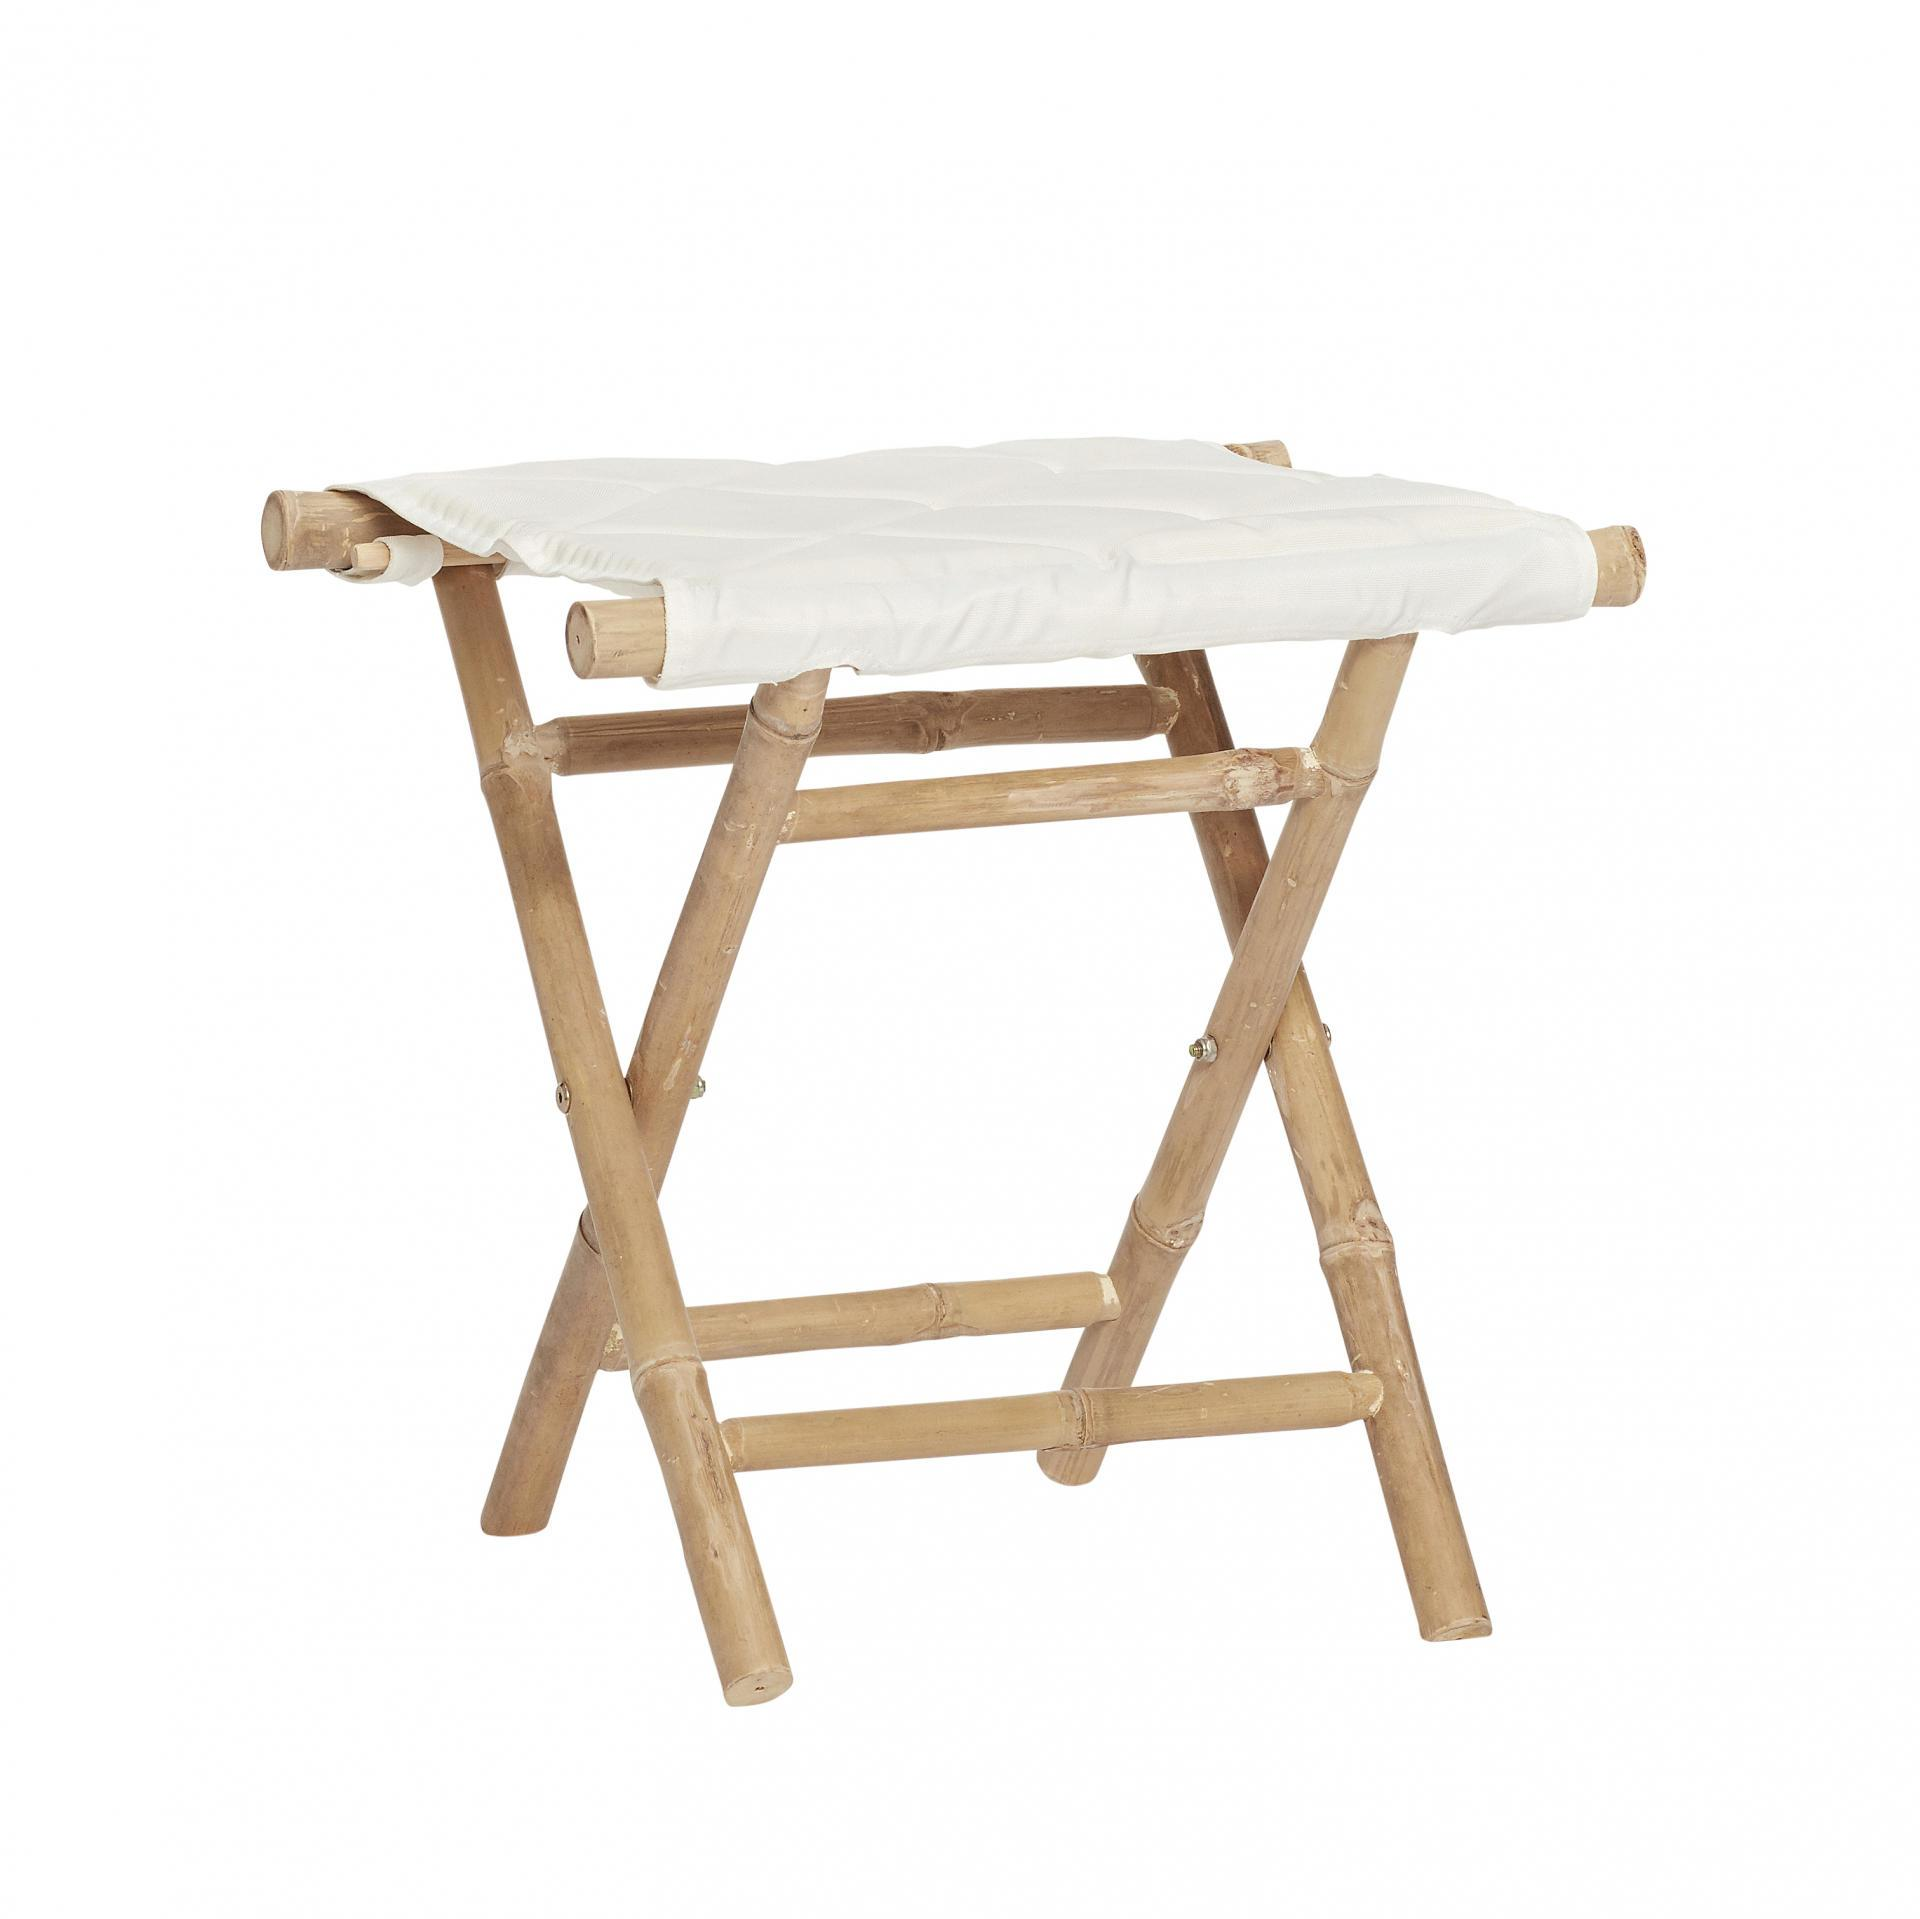 Hübsch Bambusová stolička Stool, béžová barva, bílá barva, dřevo